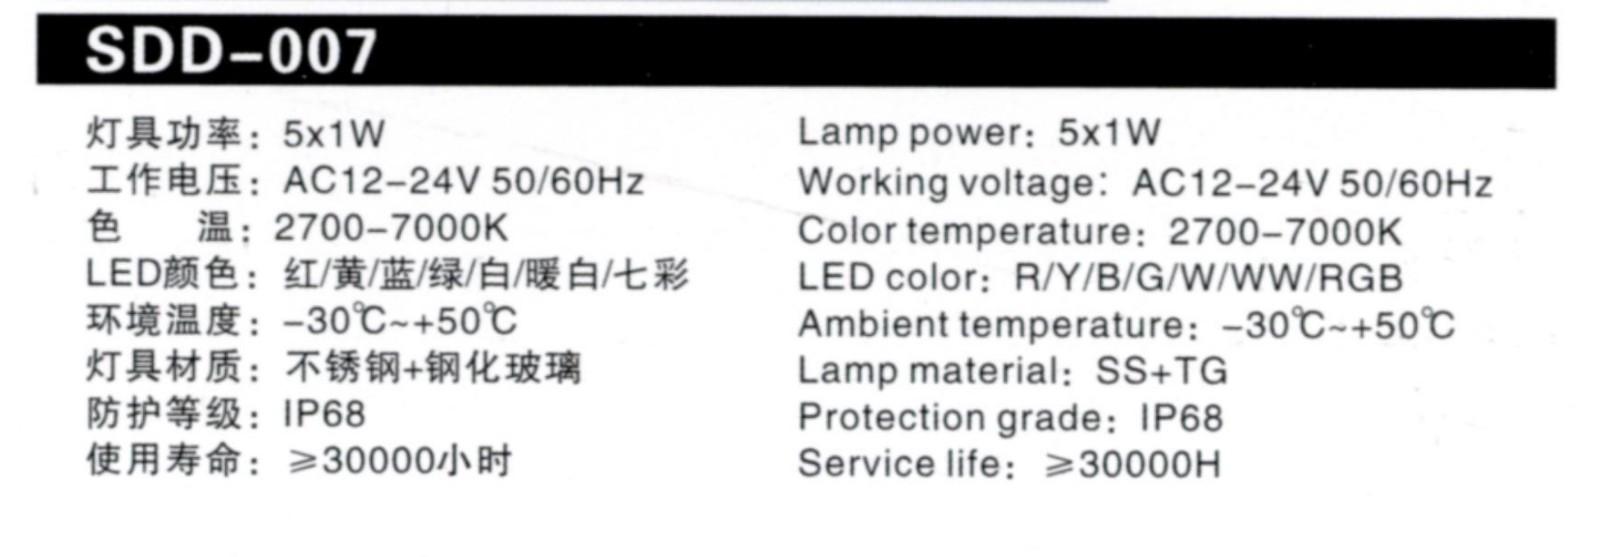 LED水底灯Model∶SDD-007参数.jpg